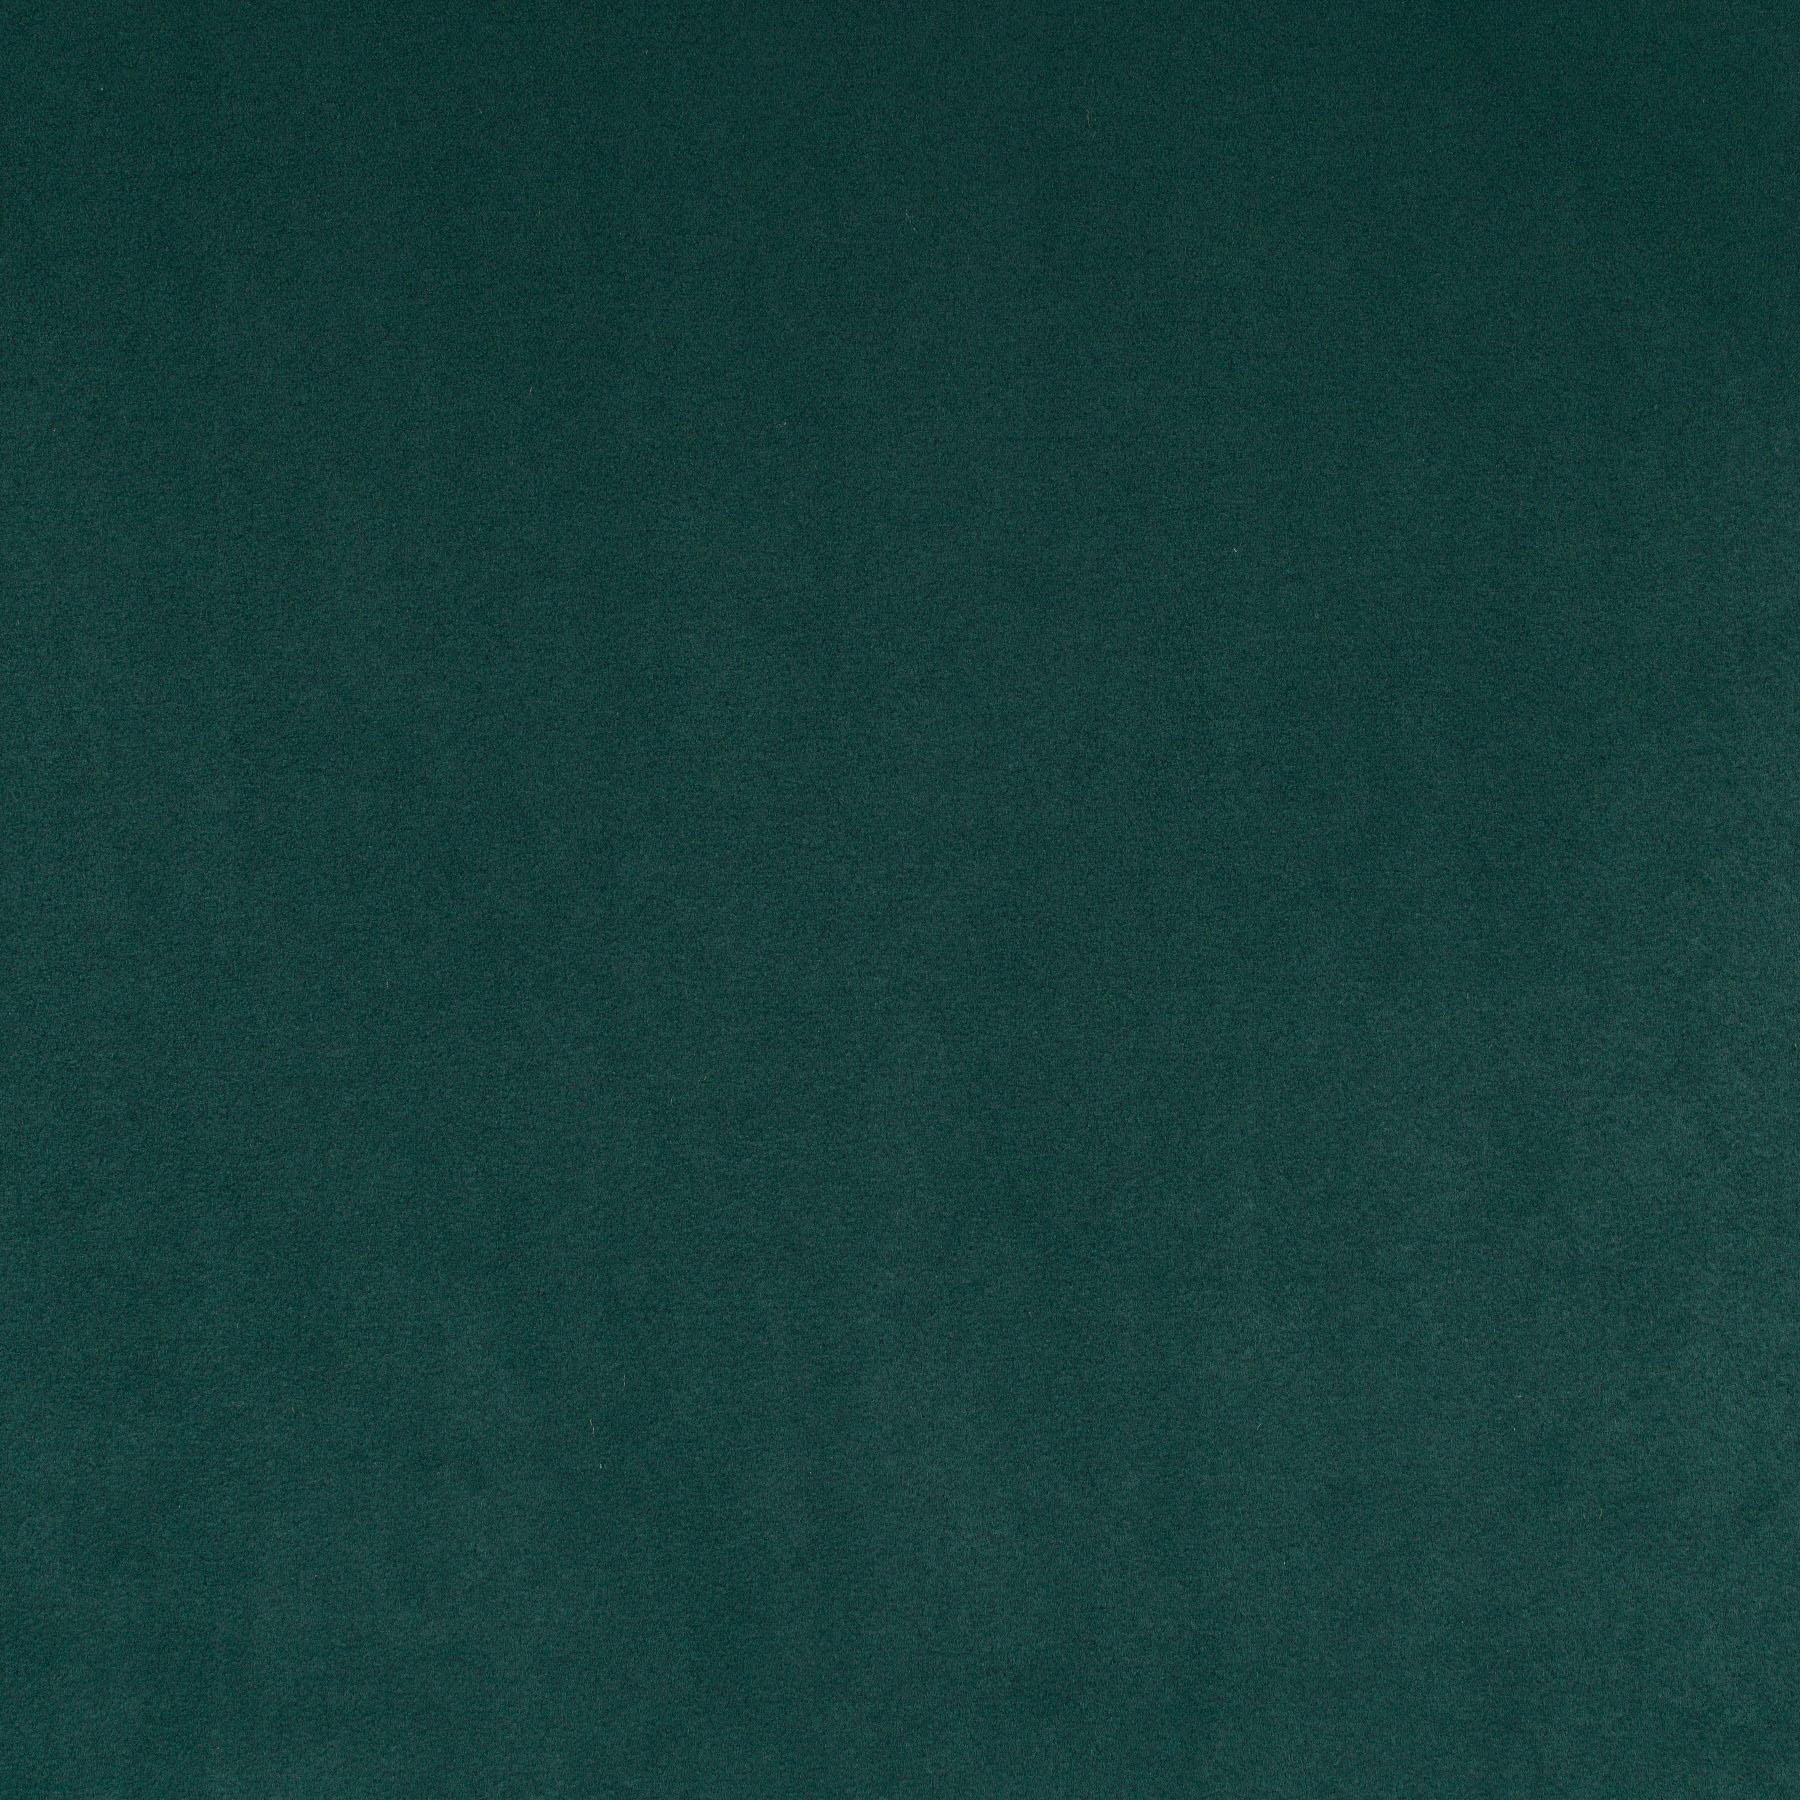 upholstery fabric jabana 1 3002 639 jab anstoetz fabrics. Black Bedroom Furniture Sets. Home Design Ideas